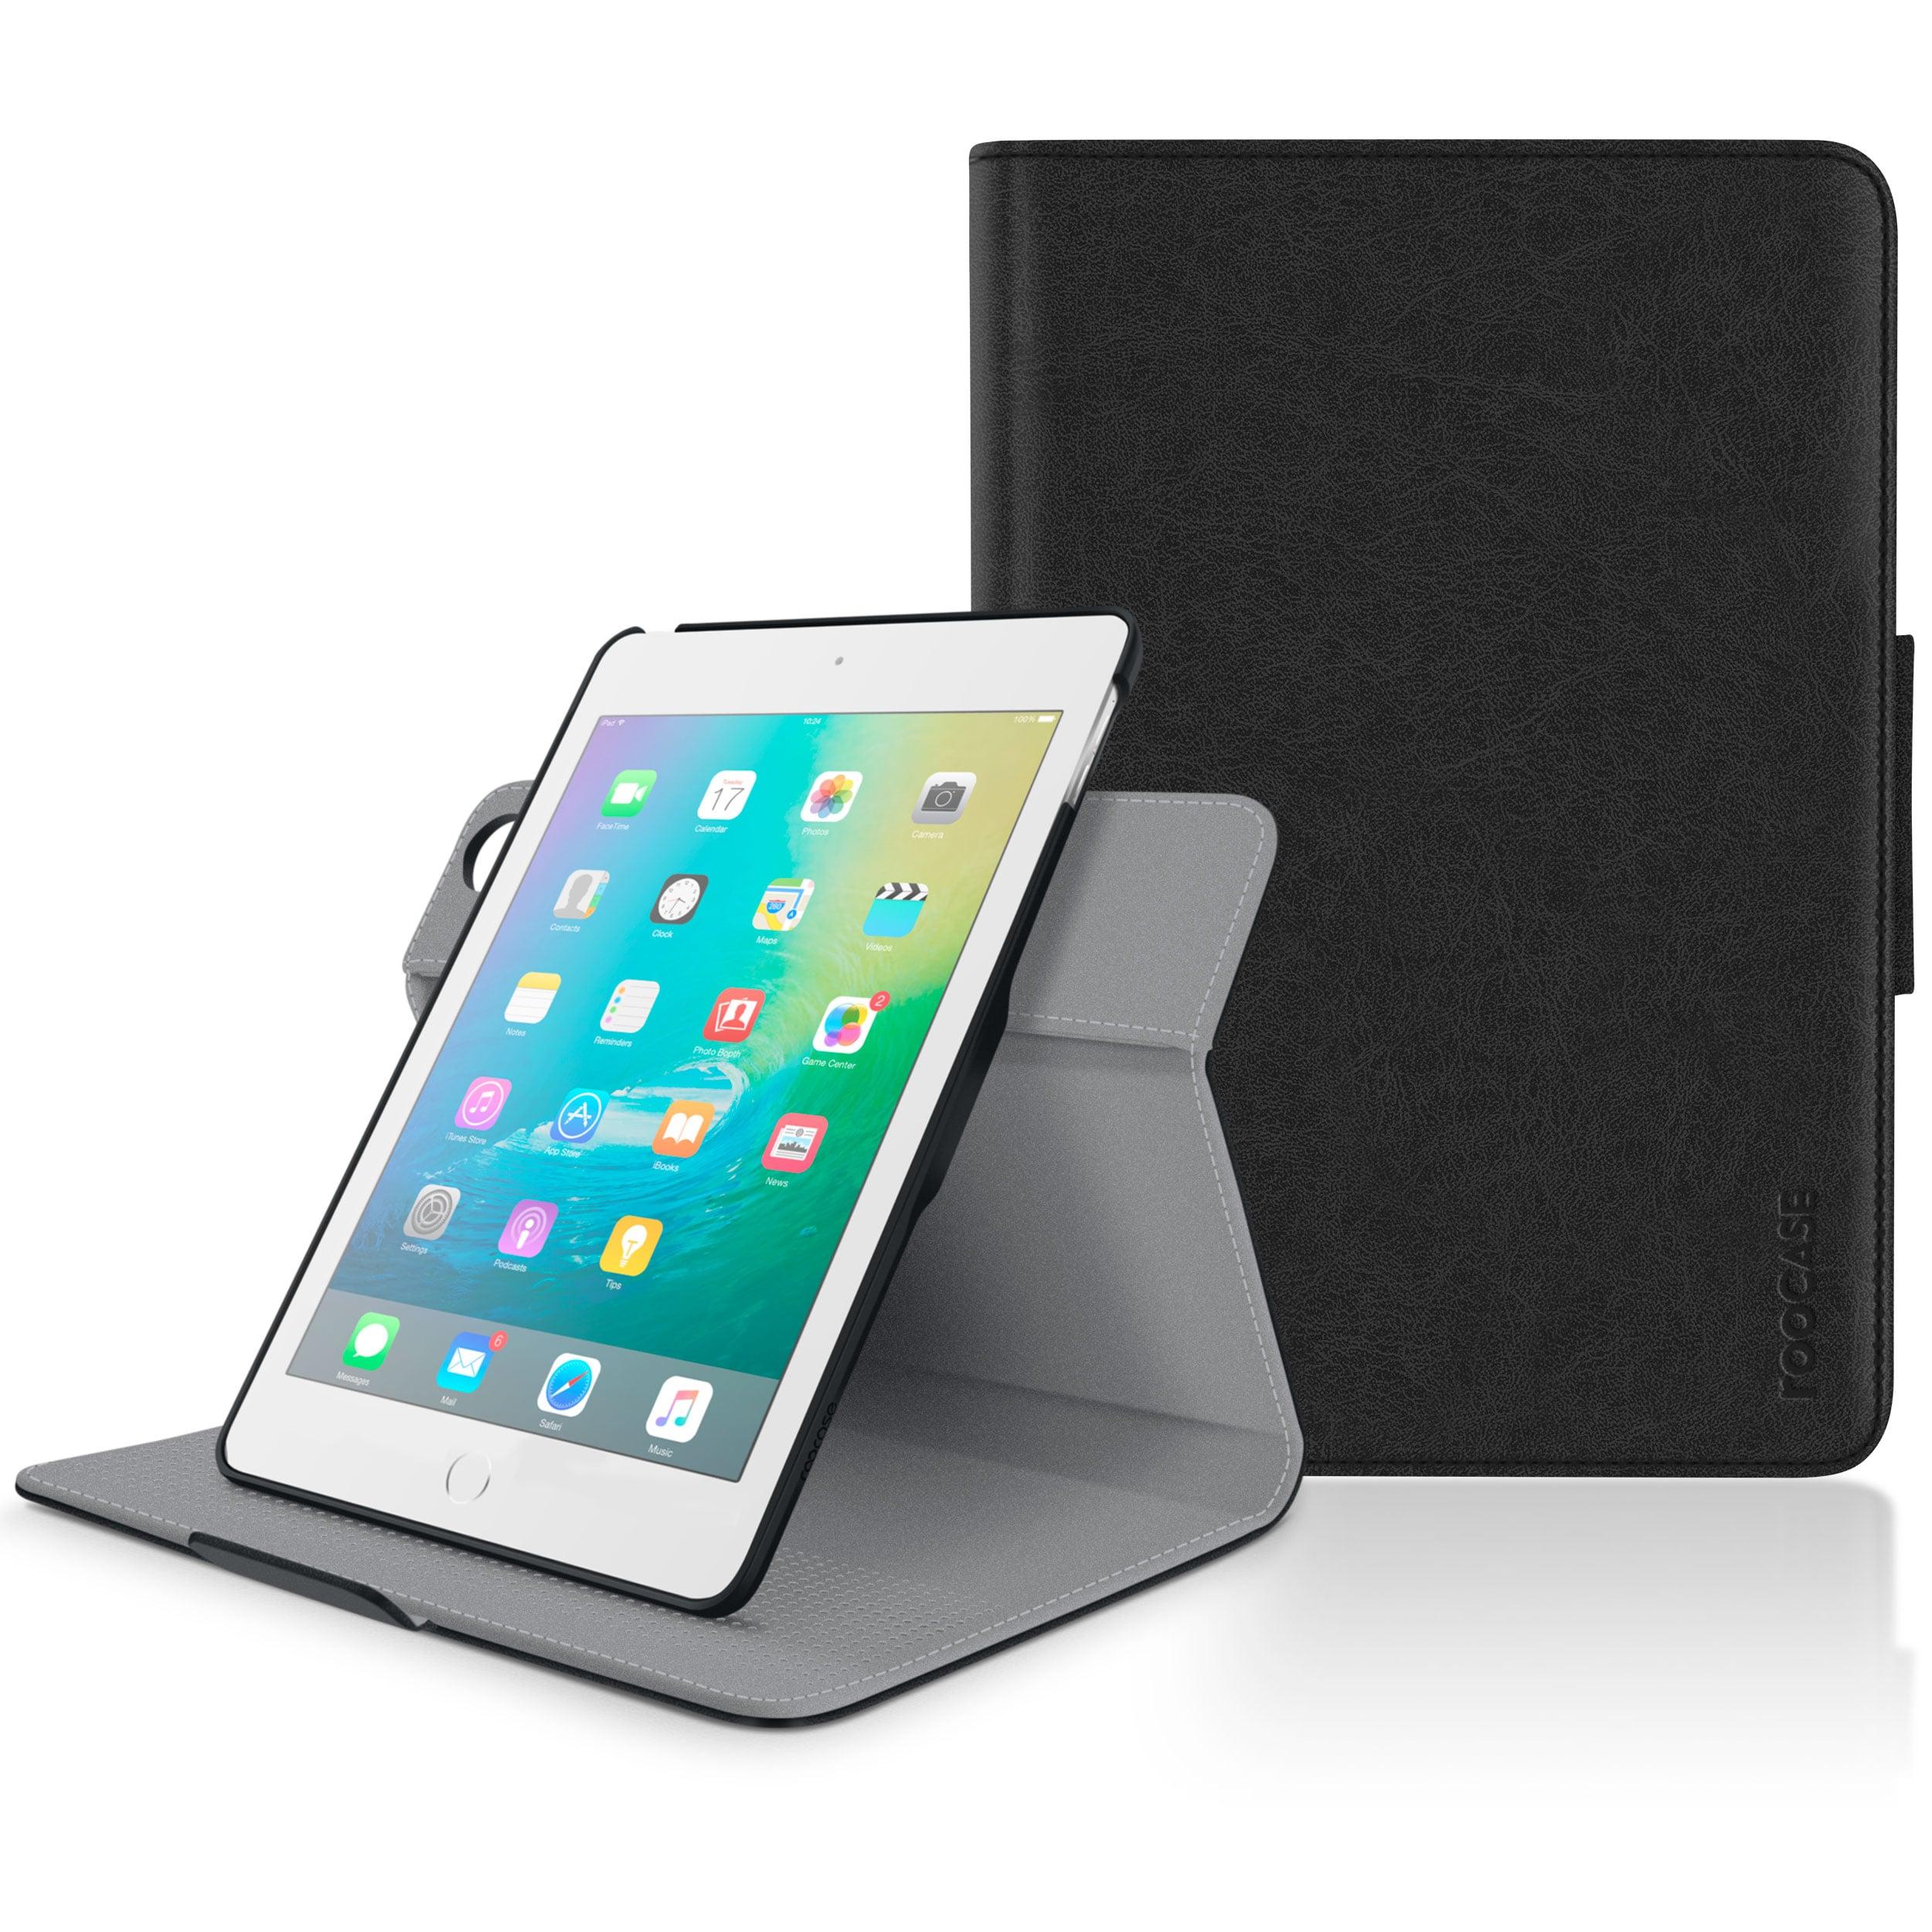 roocase Orb Folio Case for Apple iPad Mini 4